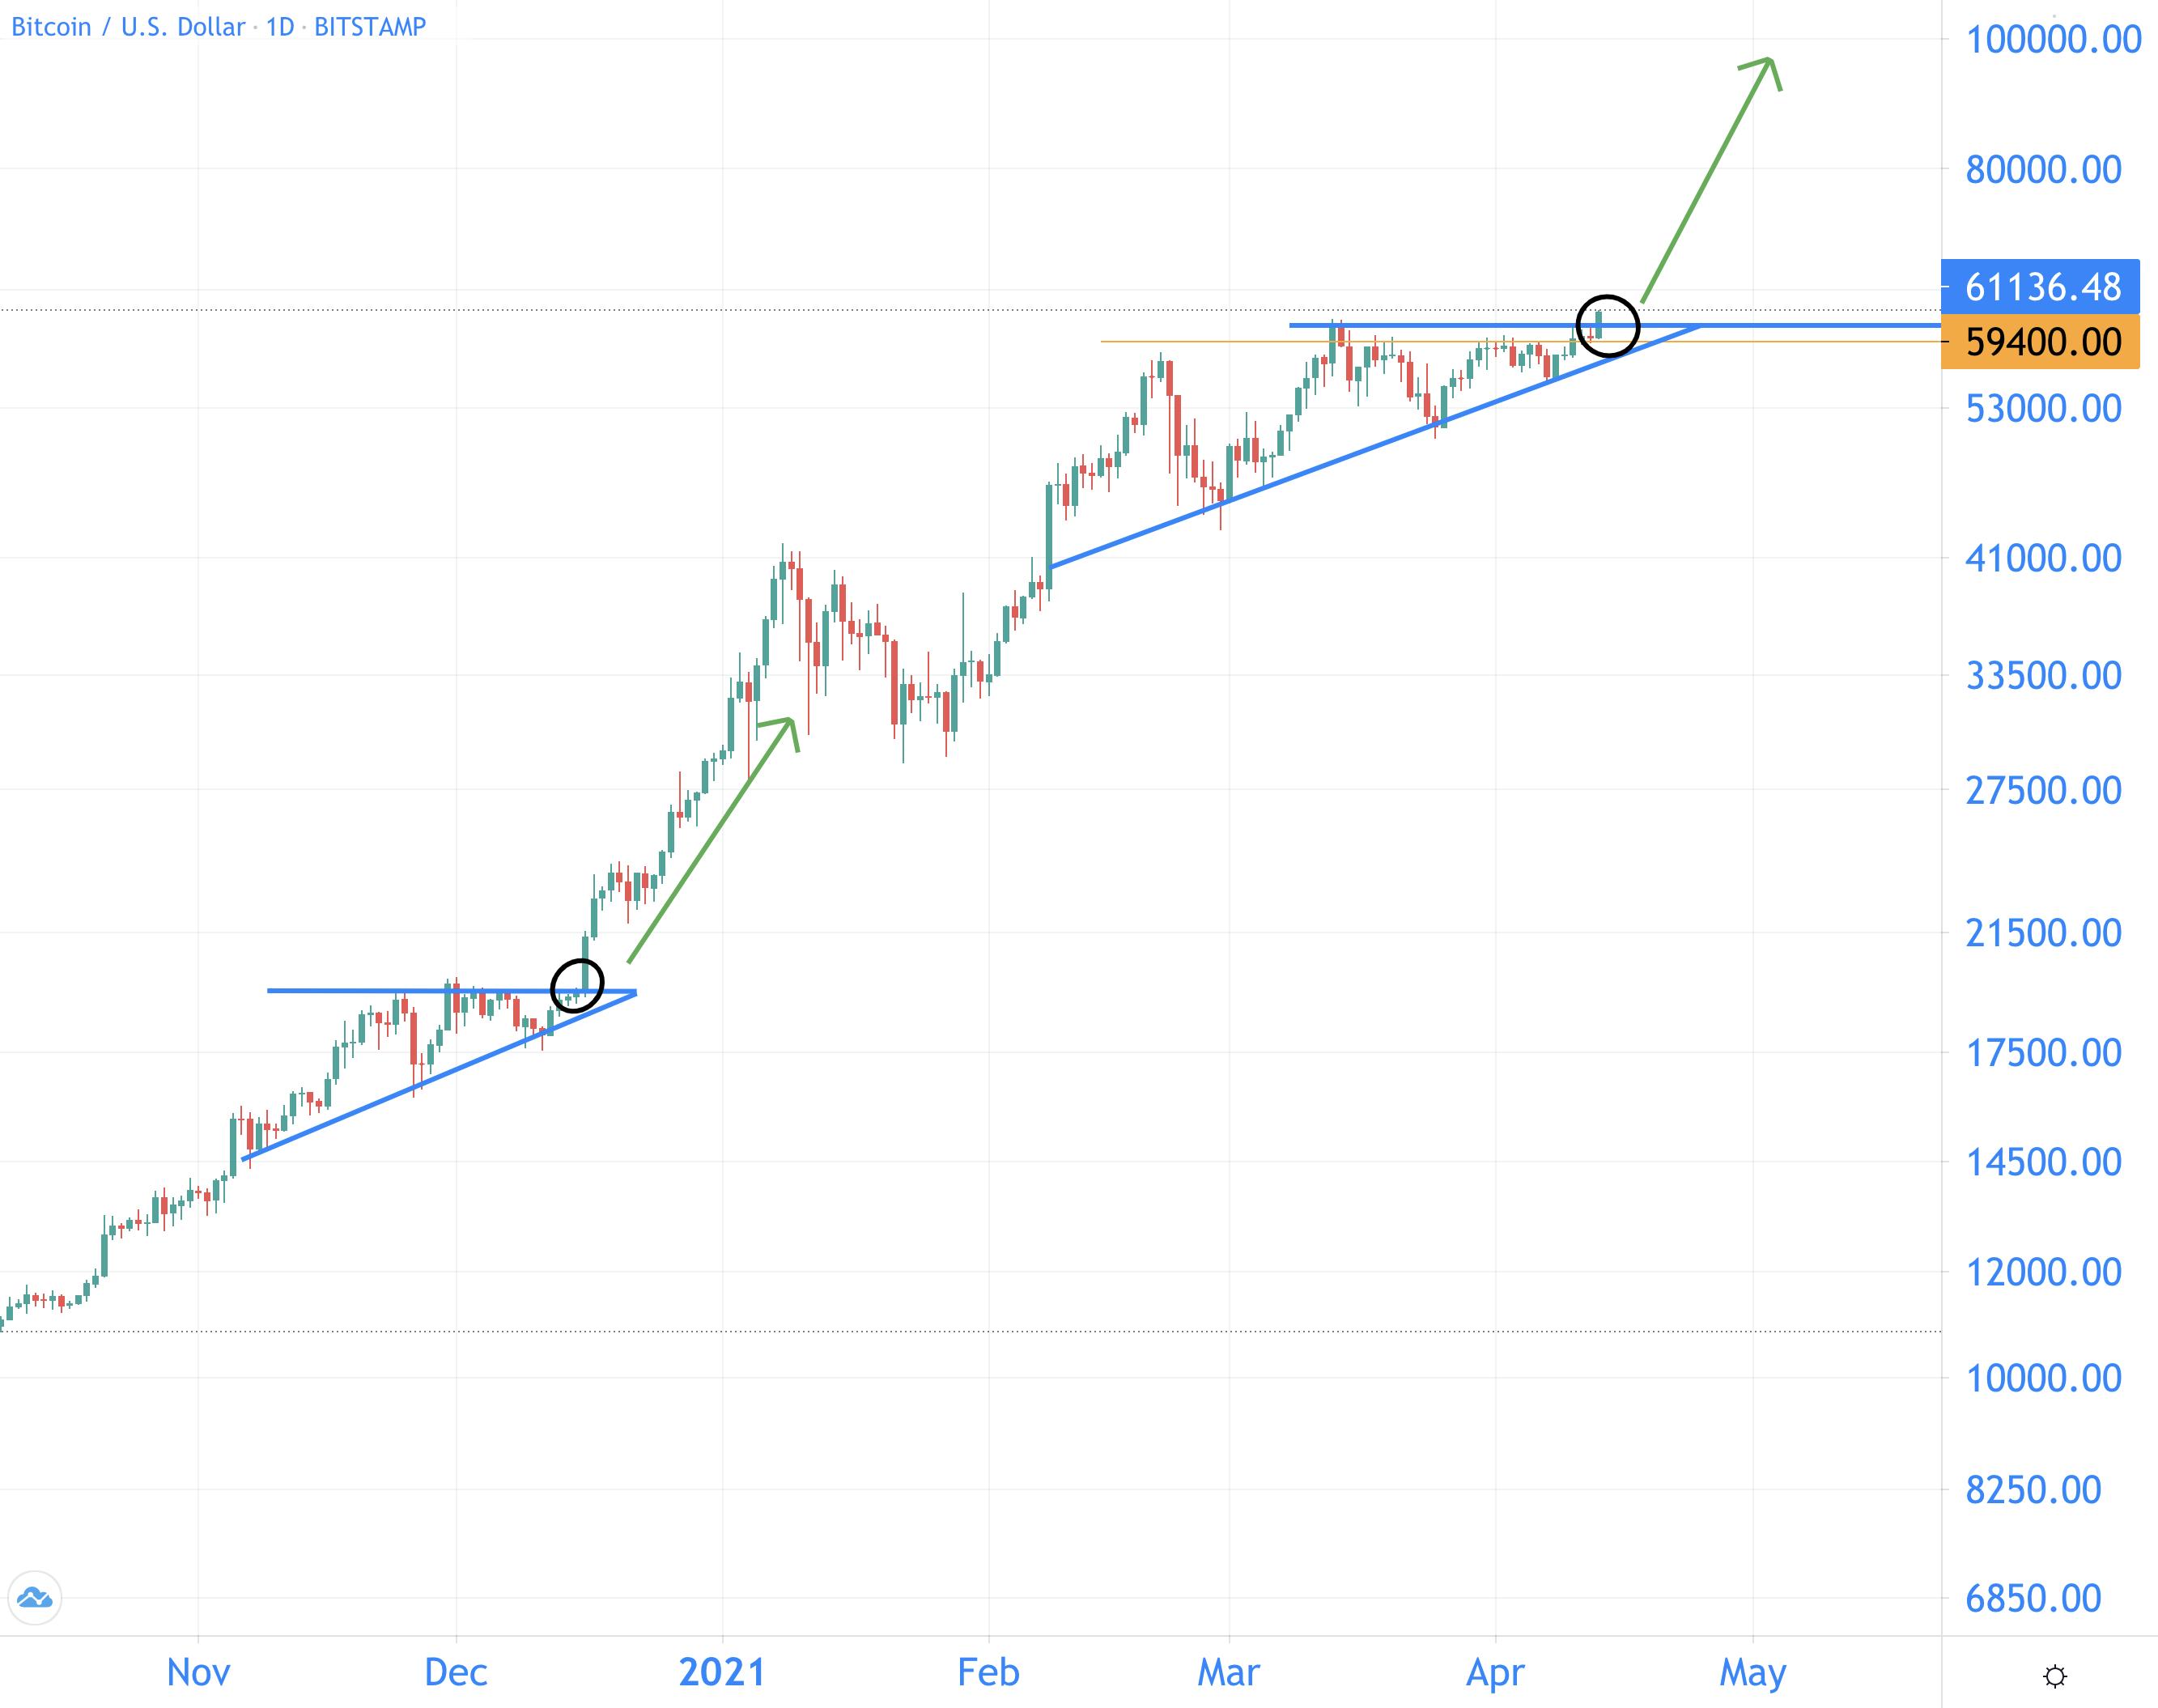 bitcoin koersdoel 2021